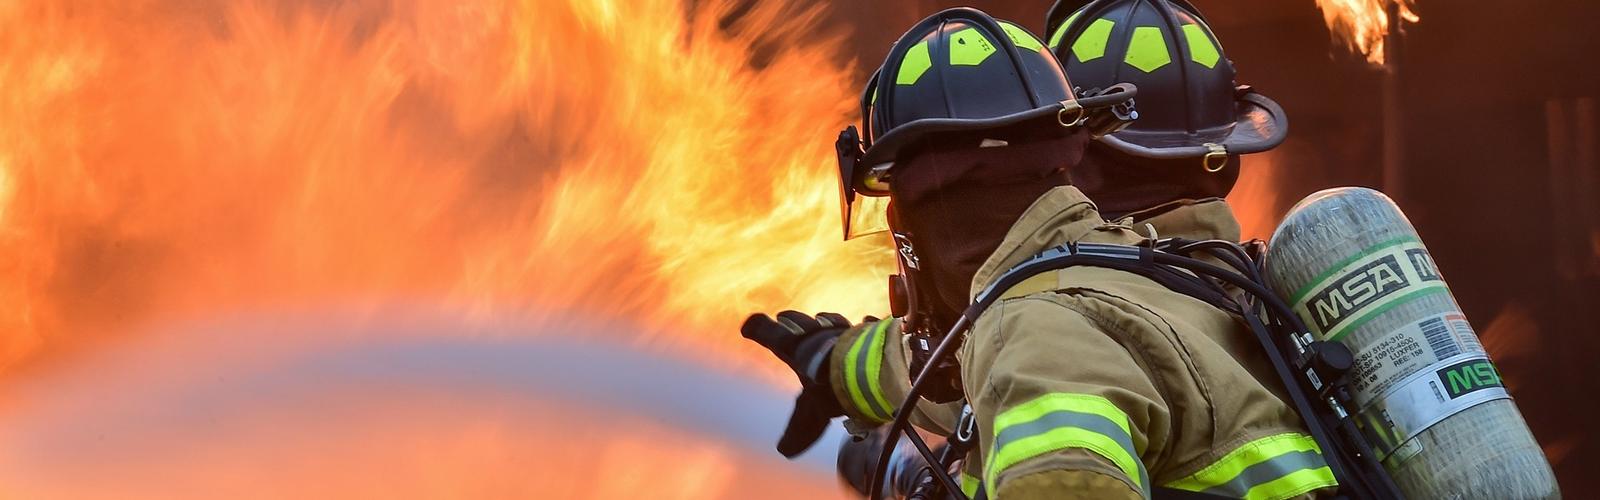 pixabay_bombeiros